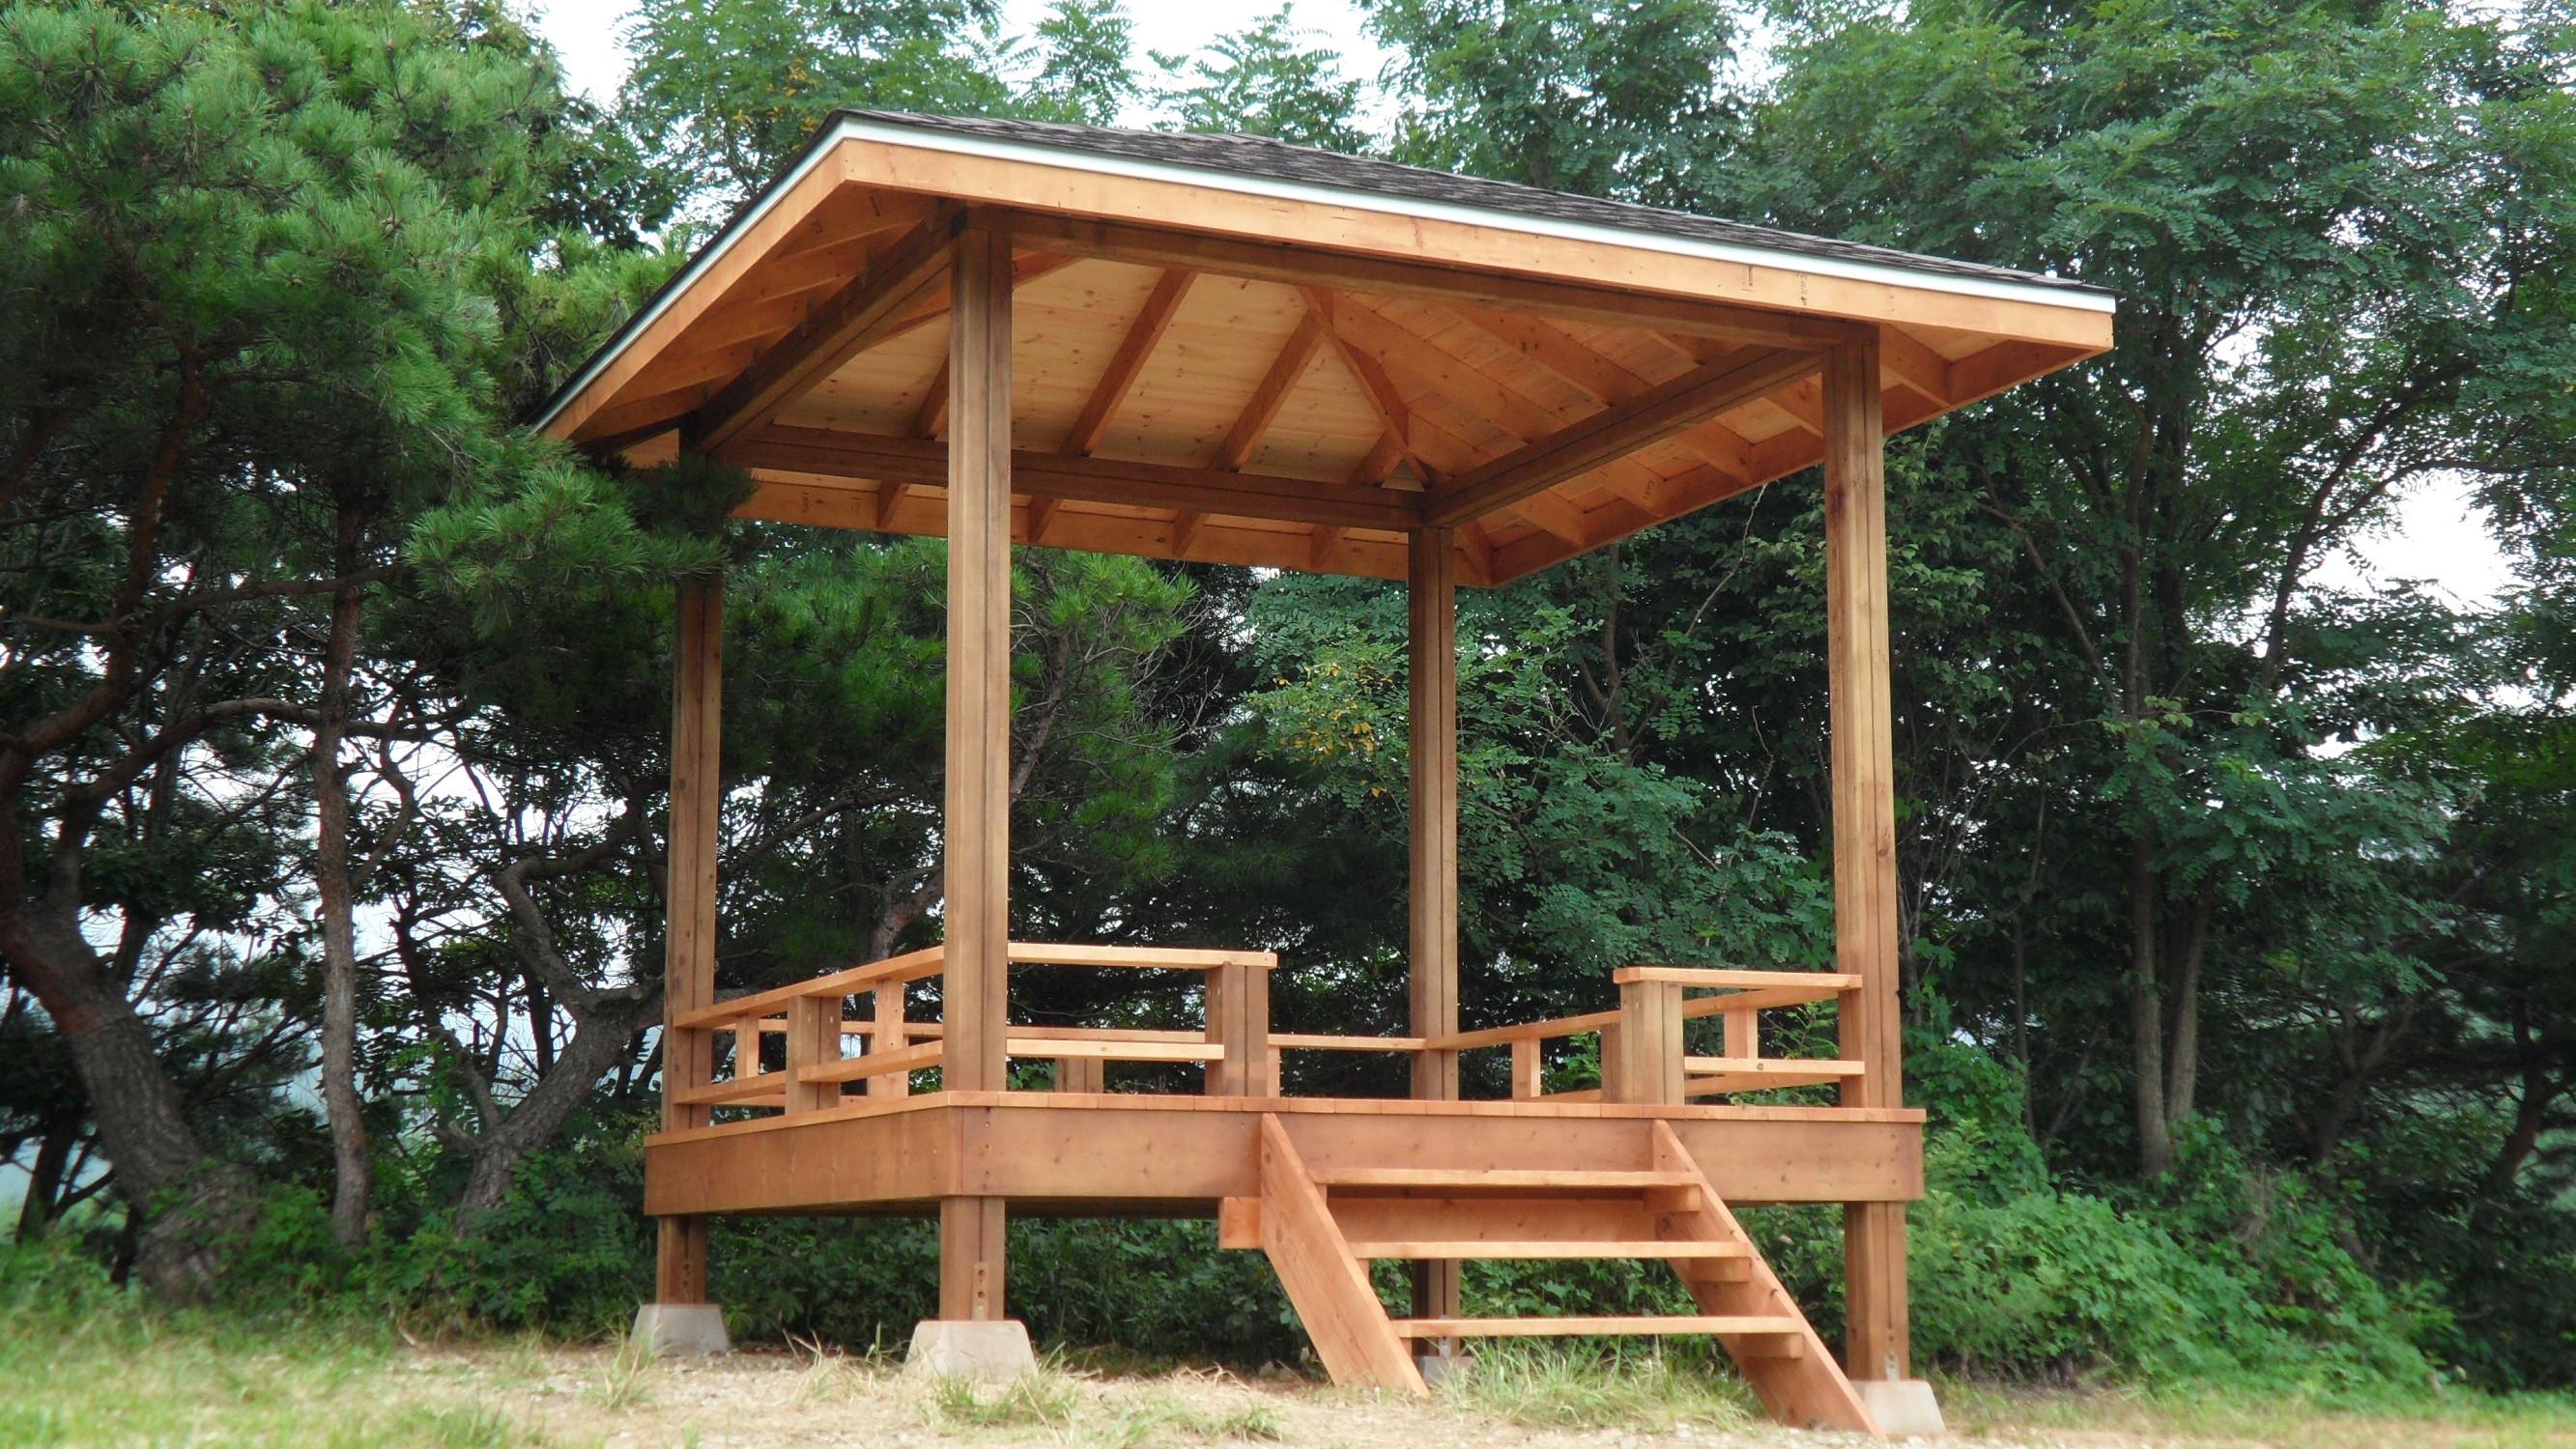 Best ideas about Backyard Creations Gazebo . Save or Pin backyard creations gazebo Tips To Choose Backyard Gazebo Now.